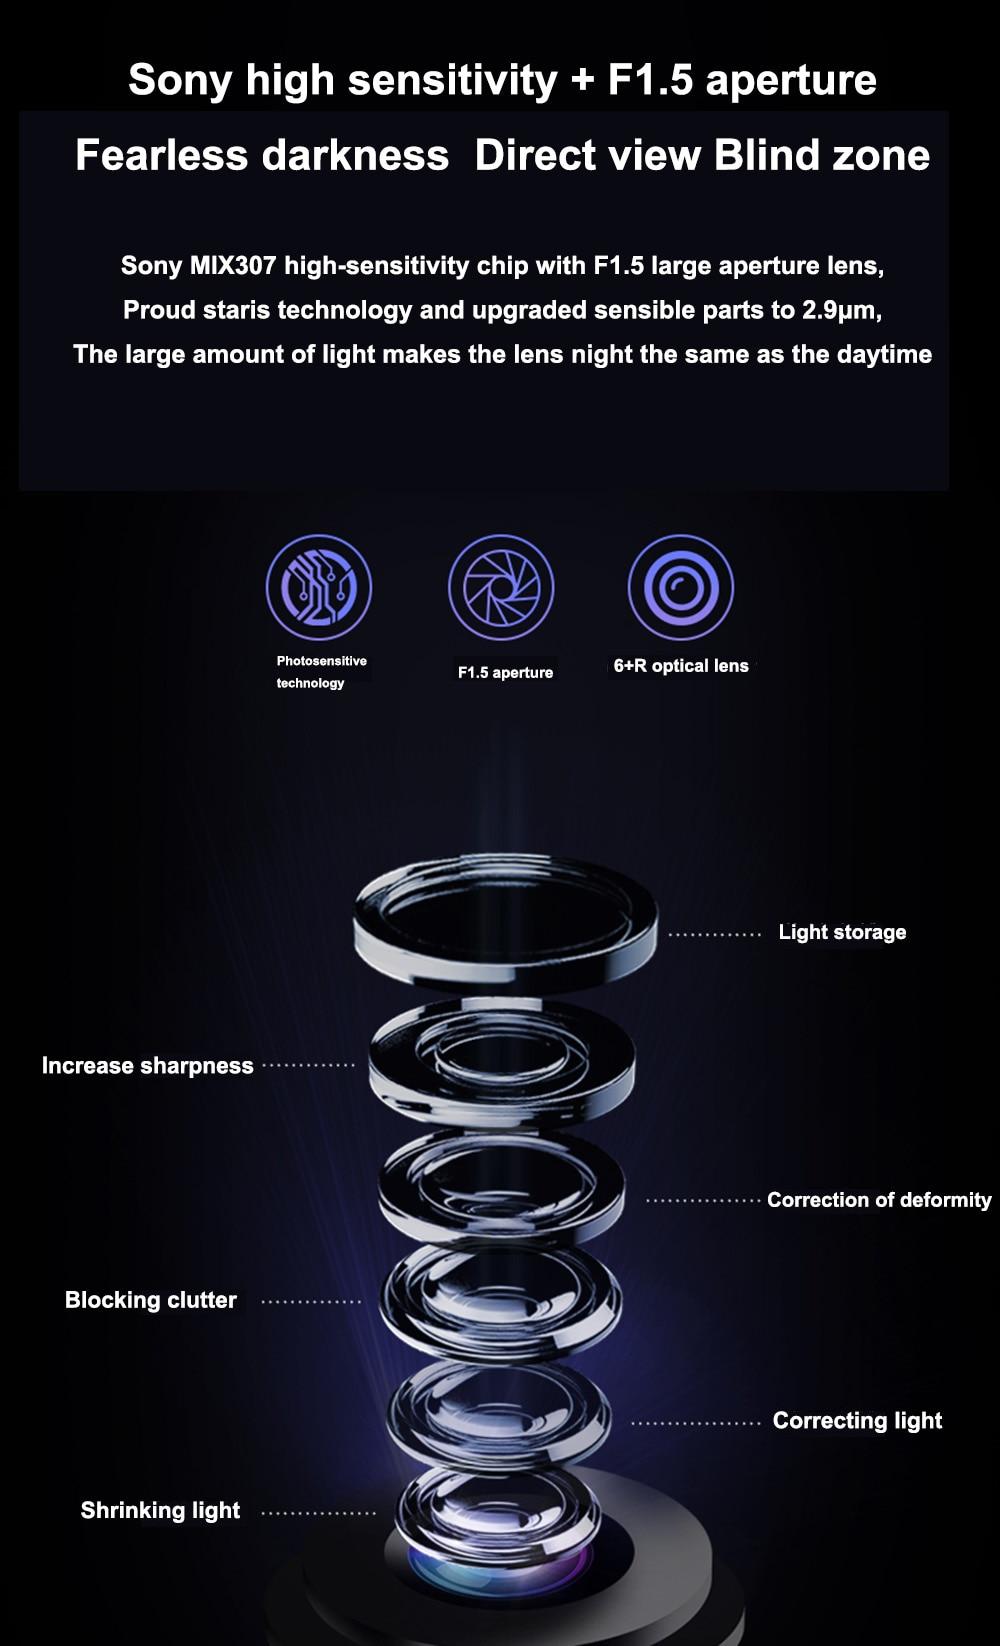 Sony high sensitivity + F1.5 aperture